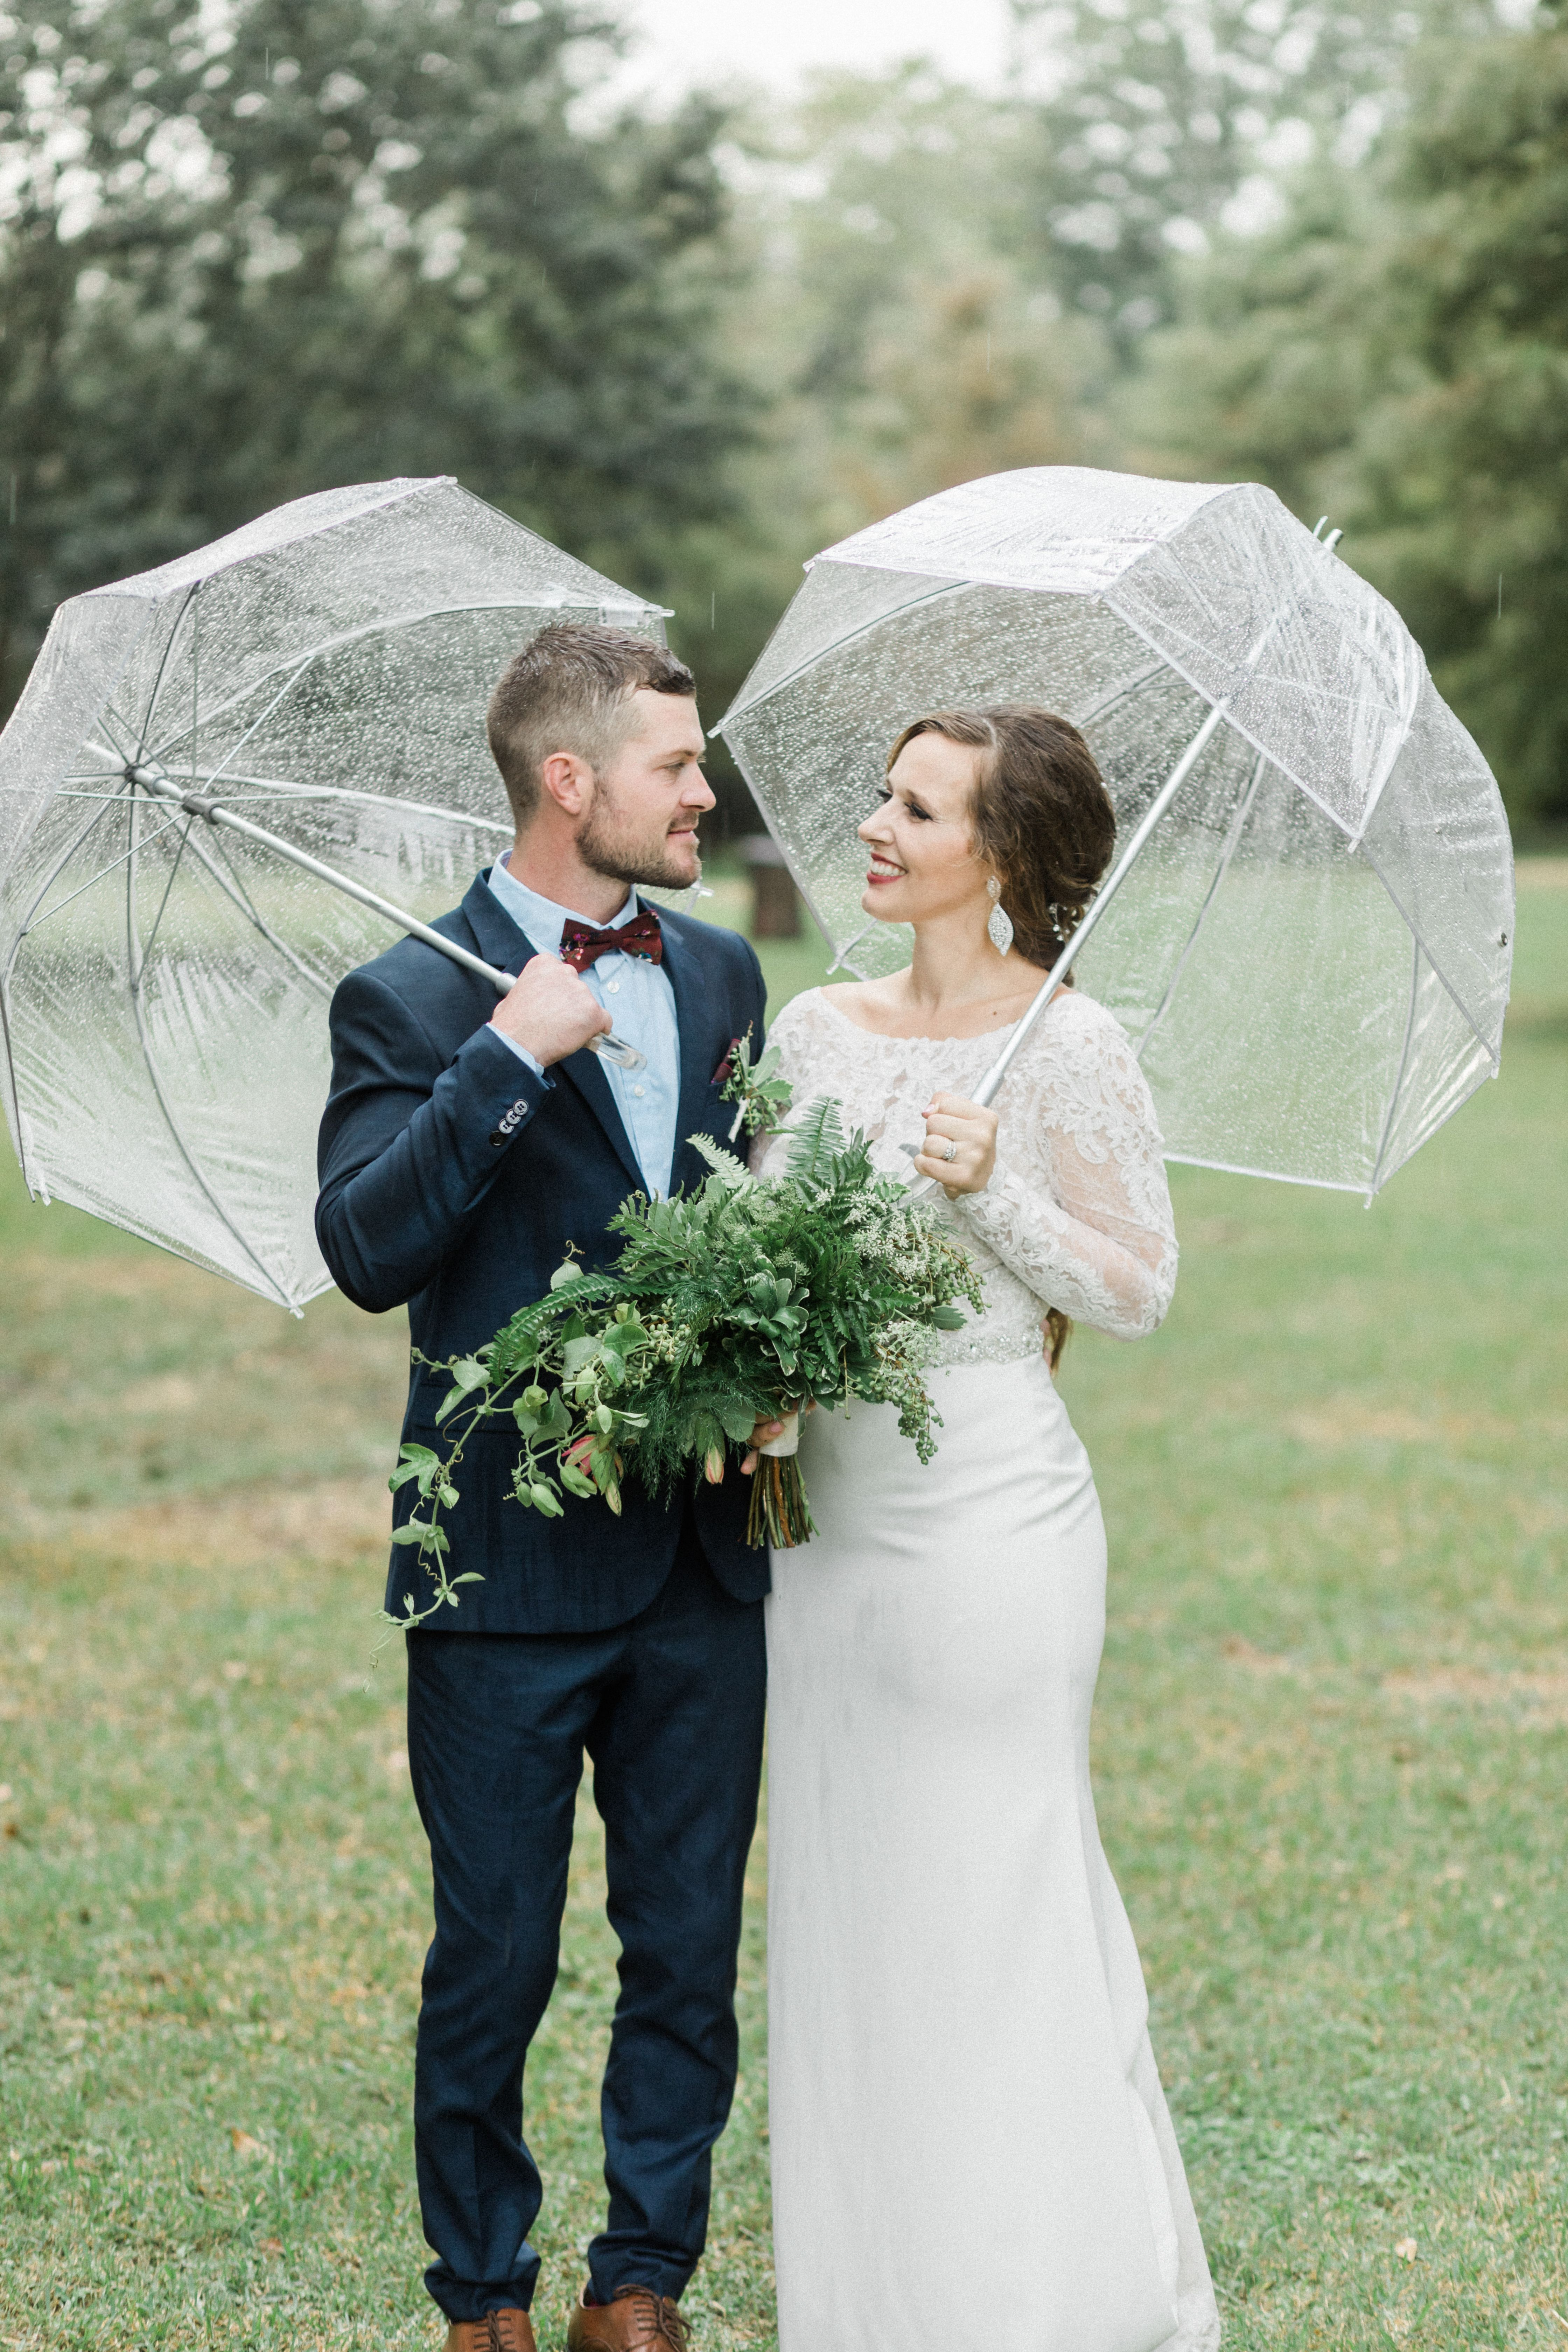 Rainy Day Wedding Inspiration In 2020 Rainy Wedding Photos Rain Wedding Photos Rain Wedding